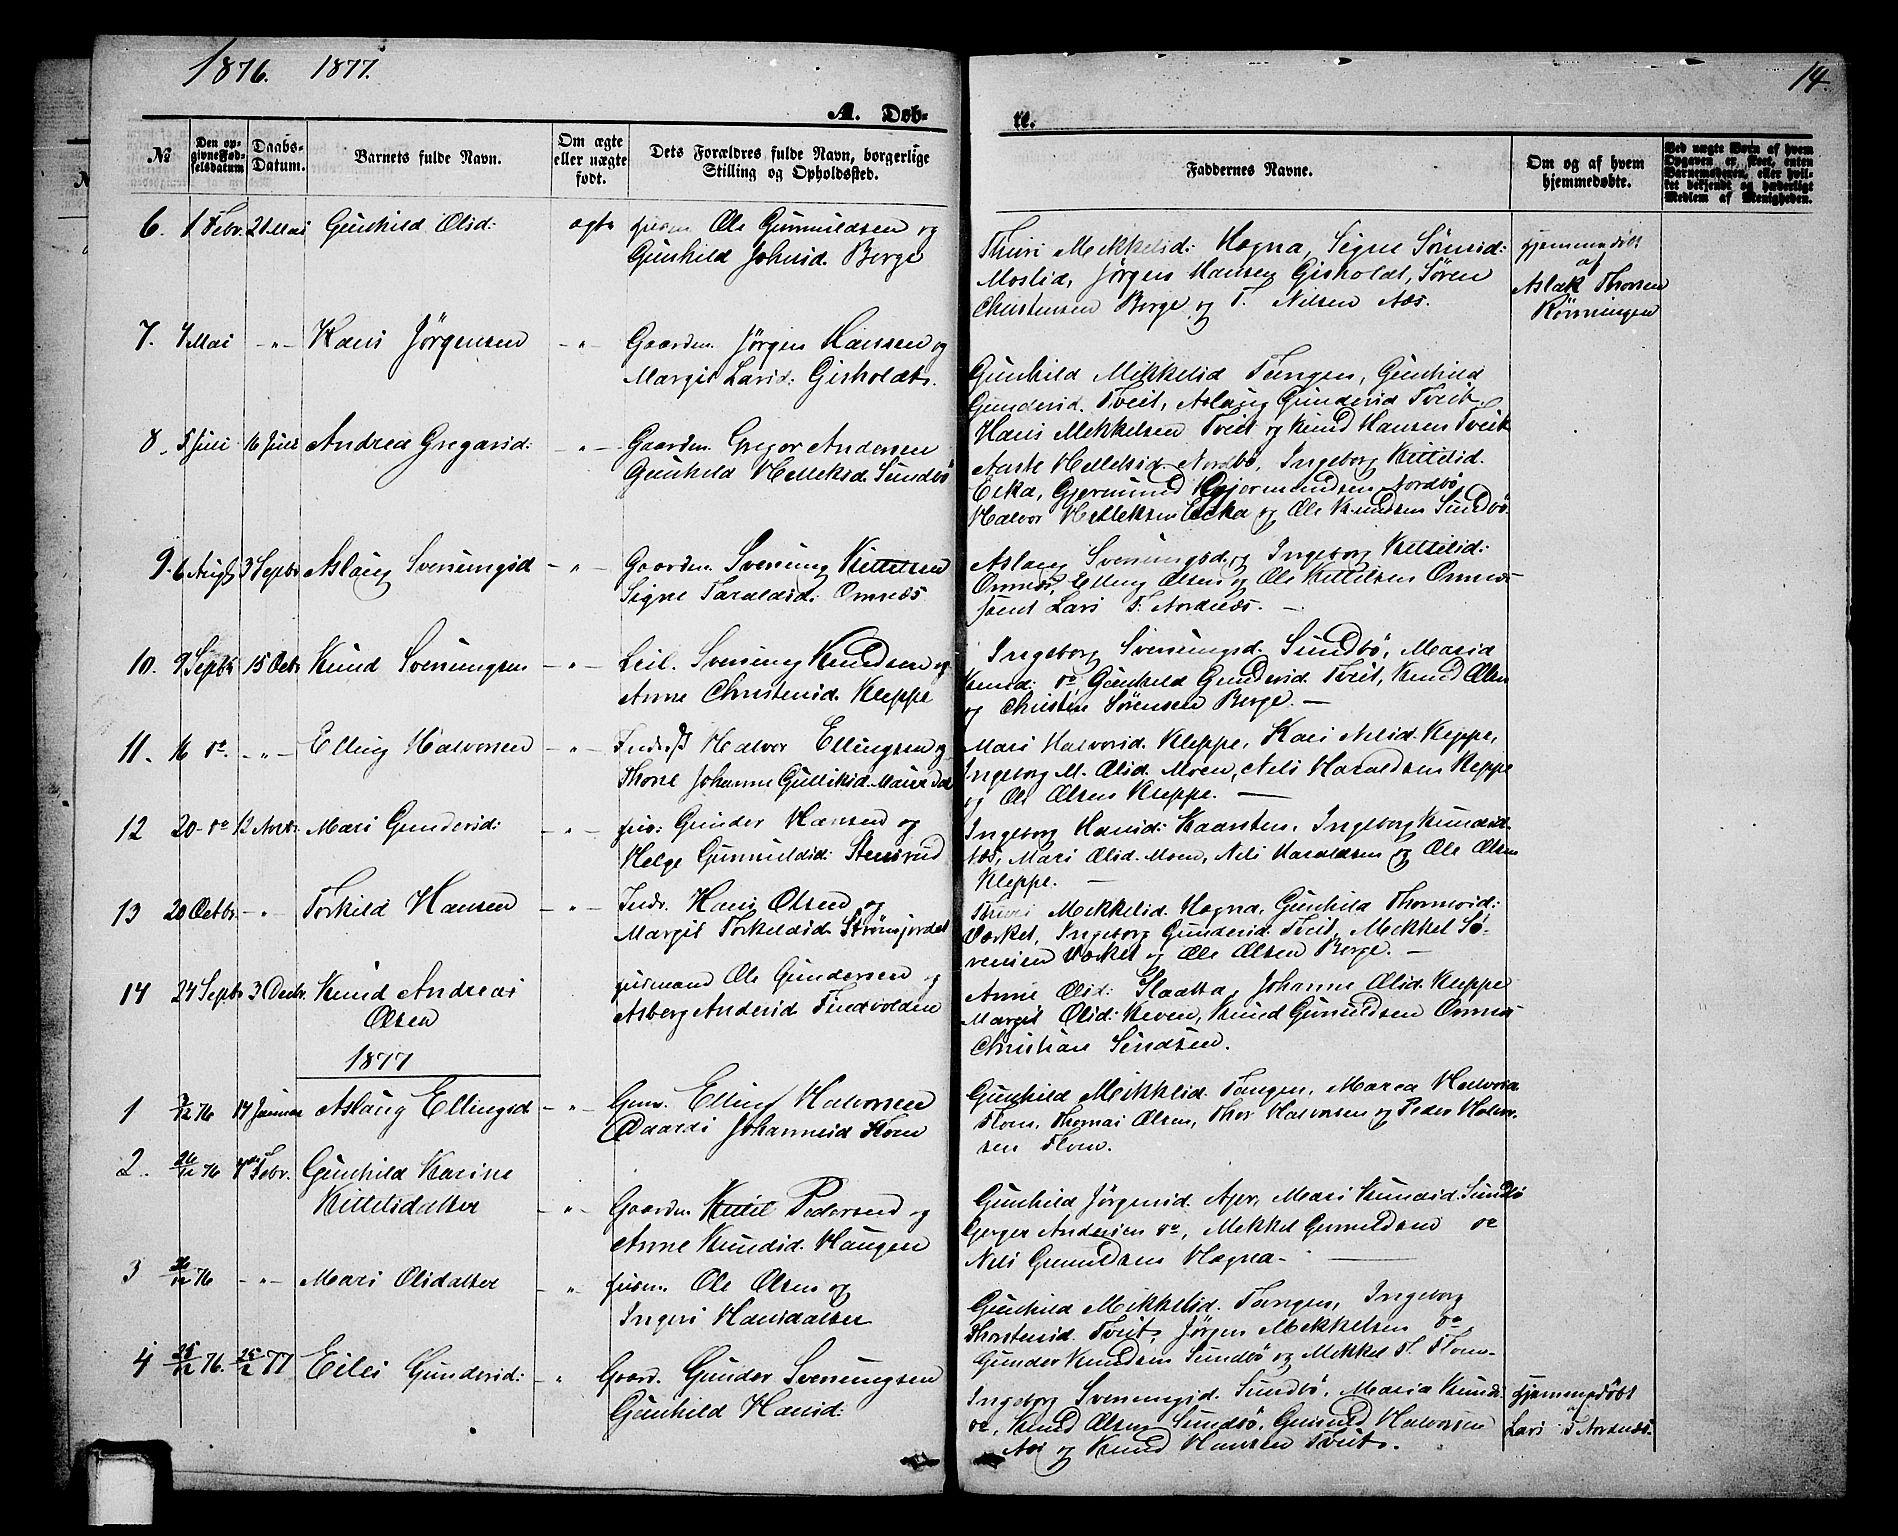 SAKO, Lunde kirkebøker, G/Gb/L0001: Klokkerbok nr. II 1, 1866-1887, s. 14